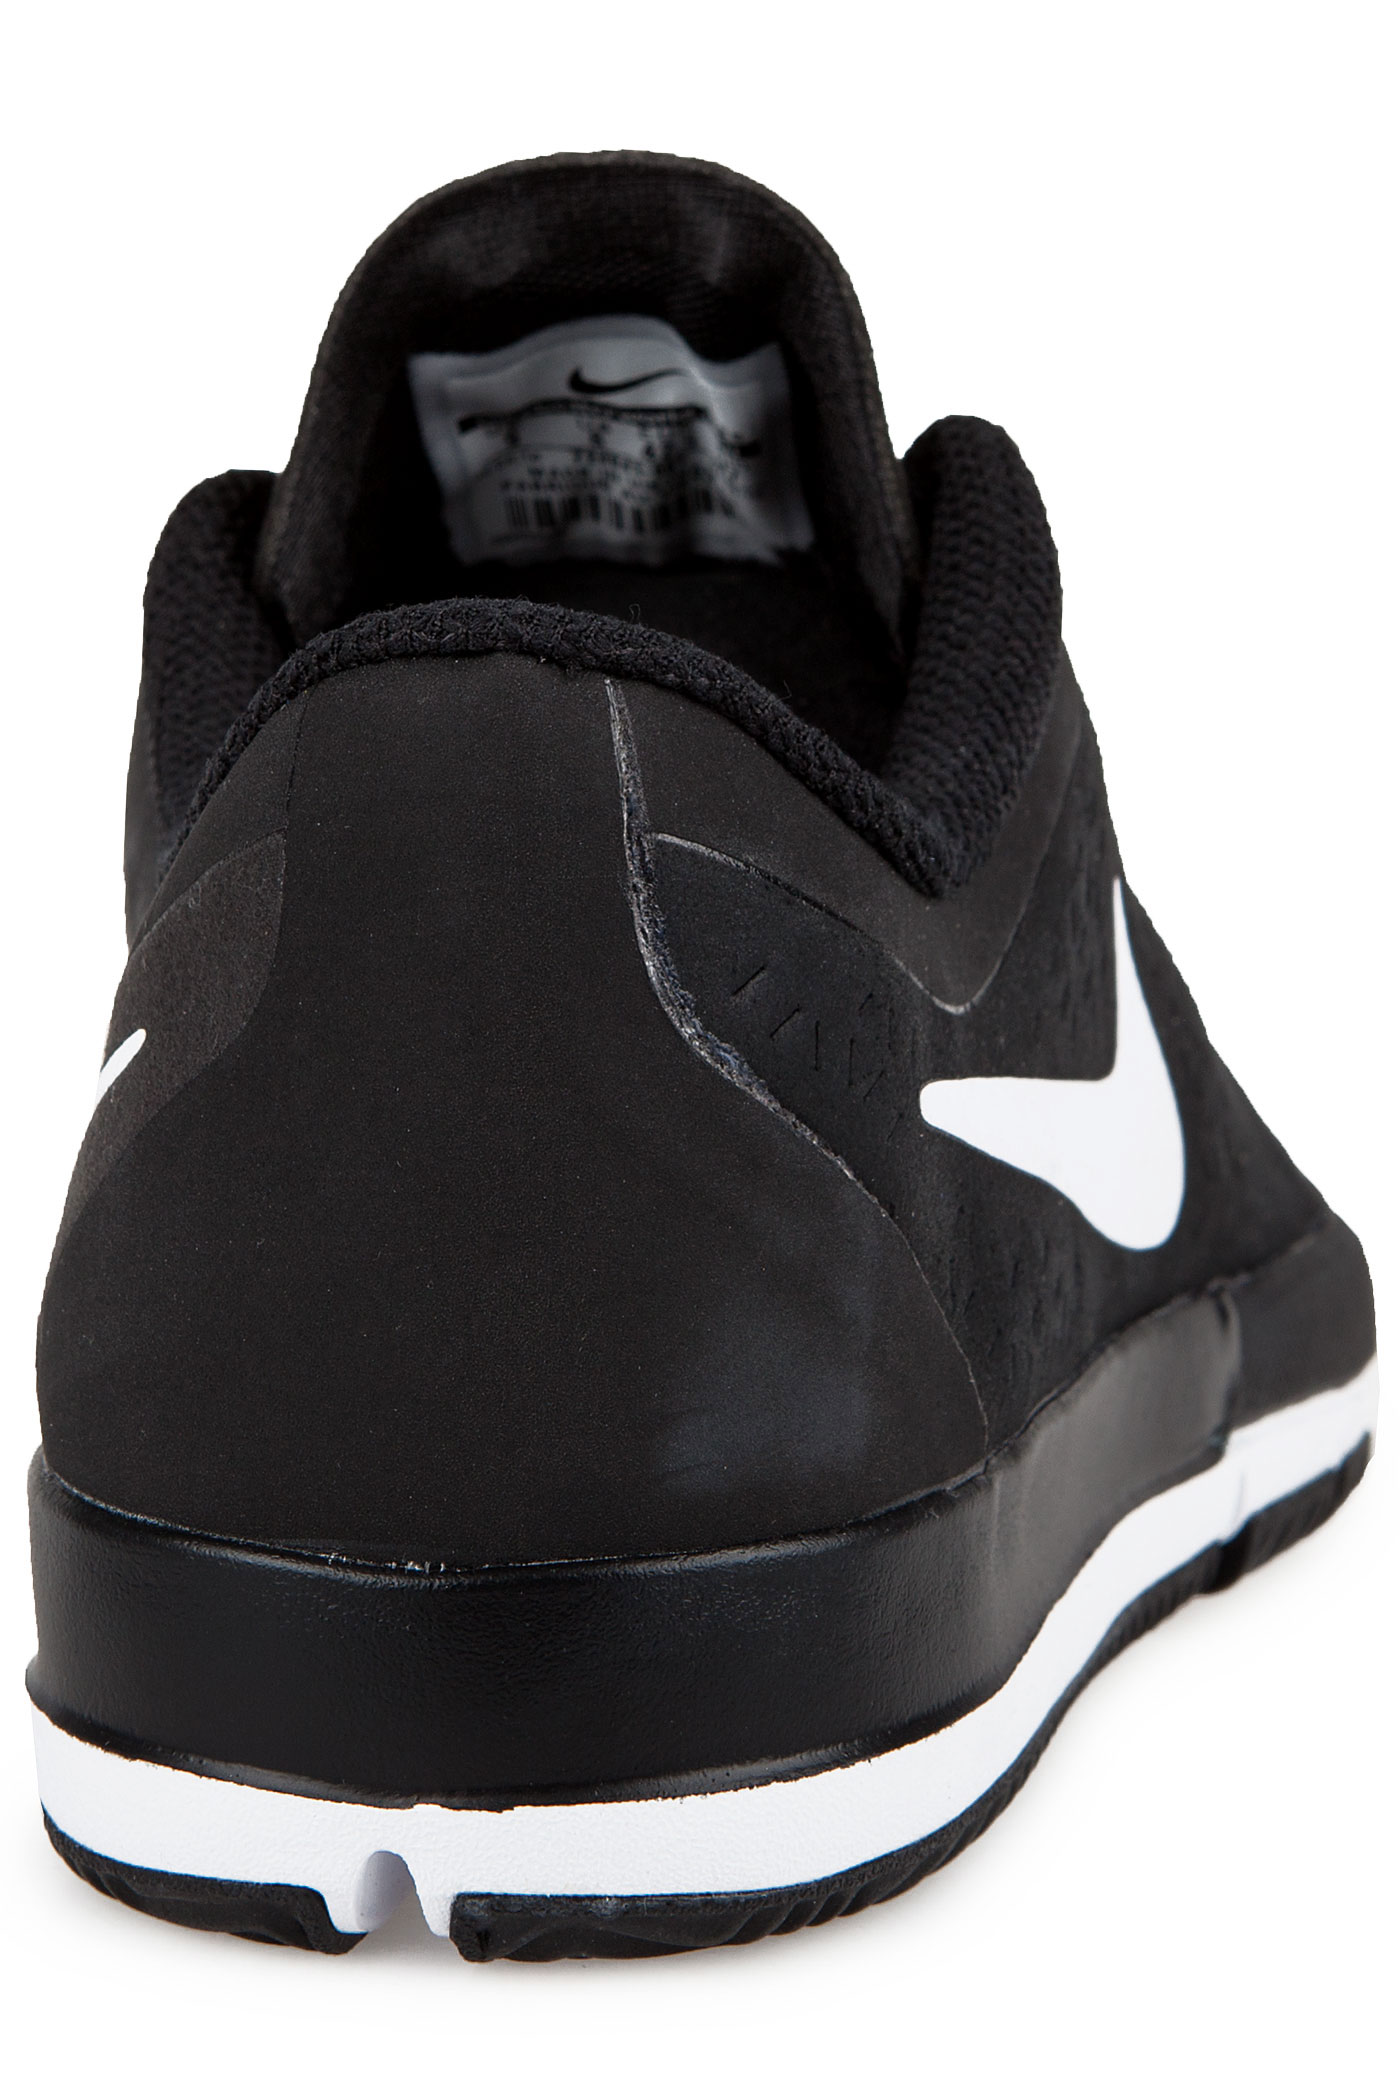 nike sb free nano chaussure black white achetez sur skatedeluxe. Black Bedroom Furniture Sets. Home Design Ideas